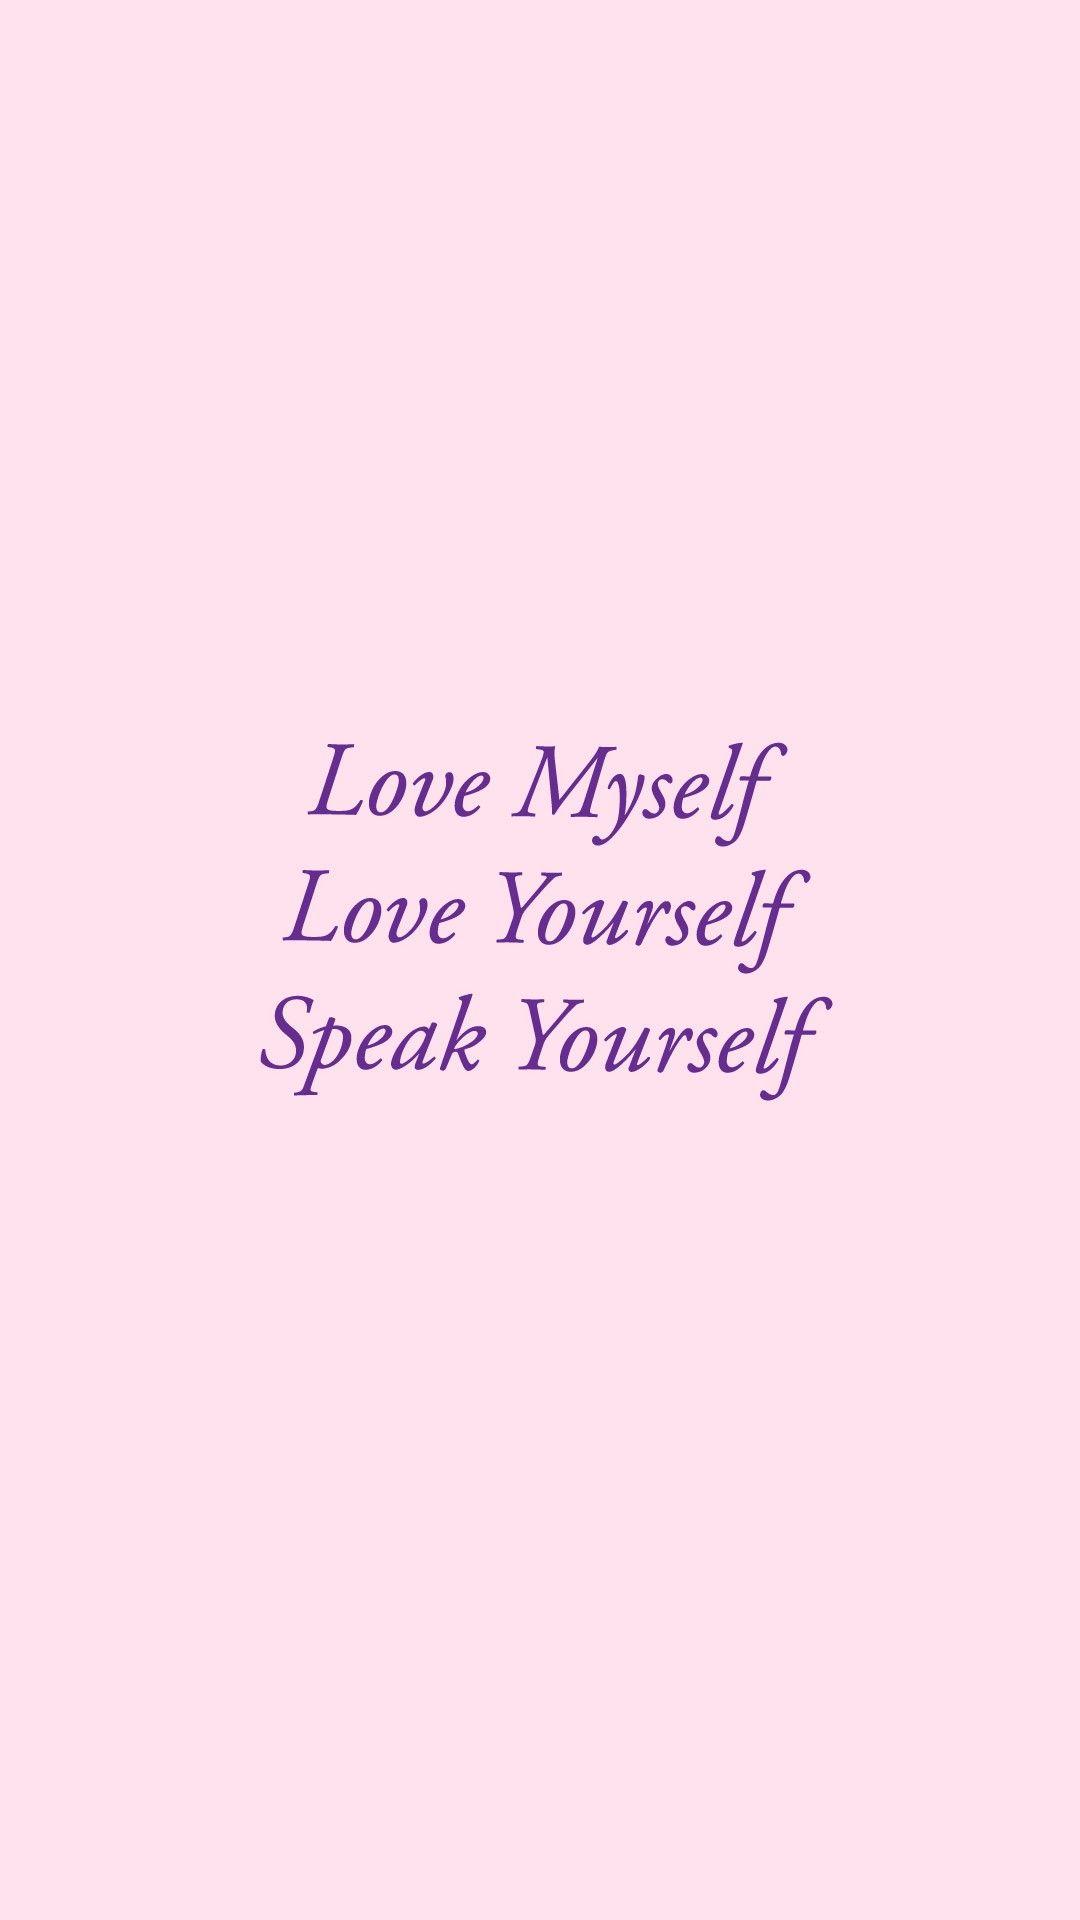 Bts Wallpaper Iphone Loveyourself In 2019 Bts Lyrics